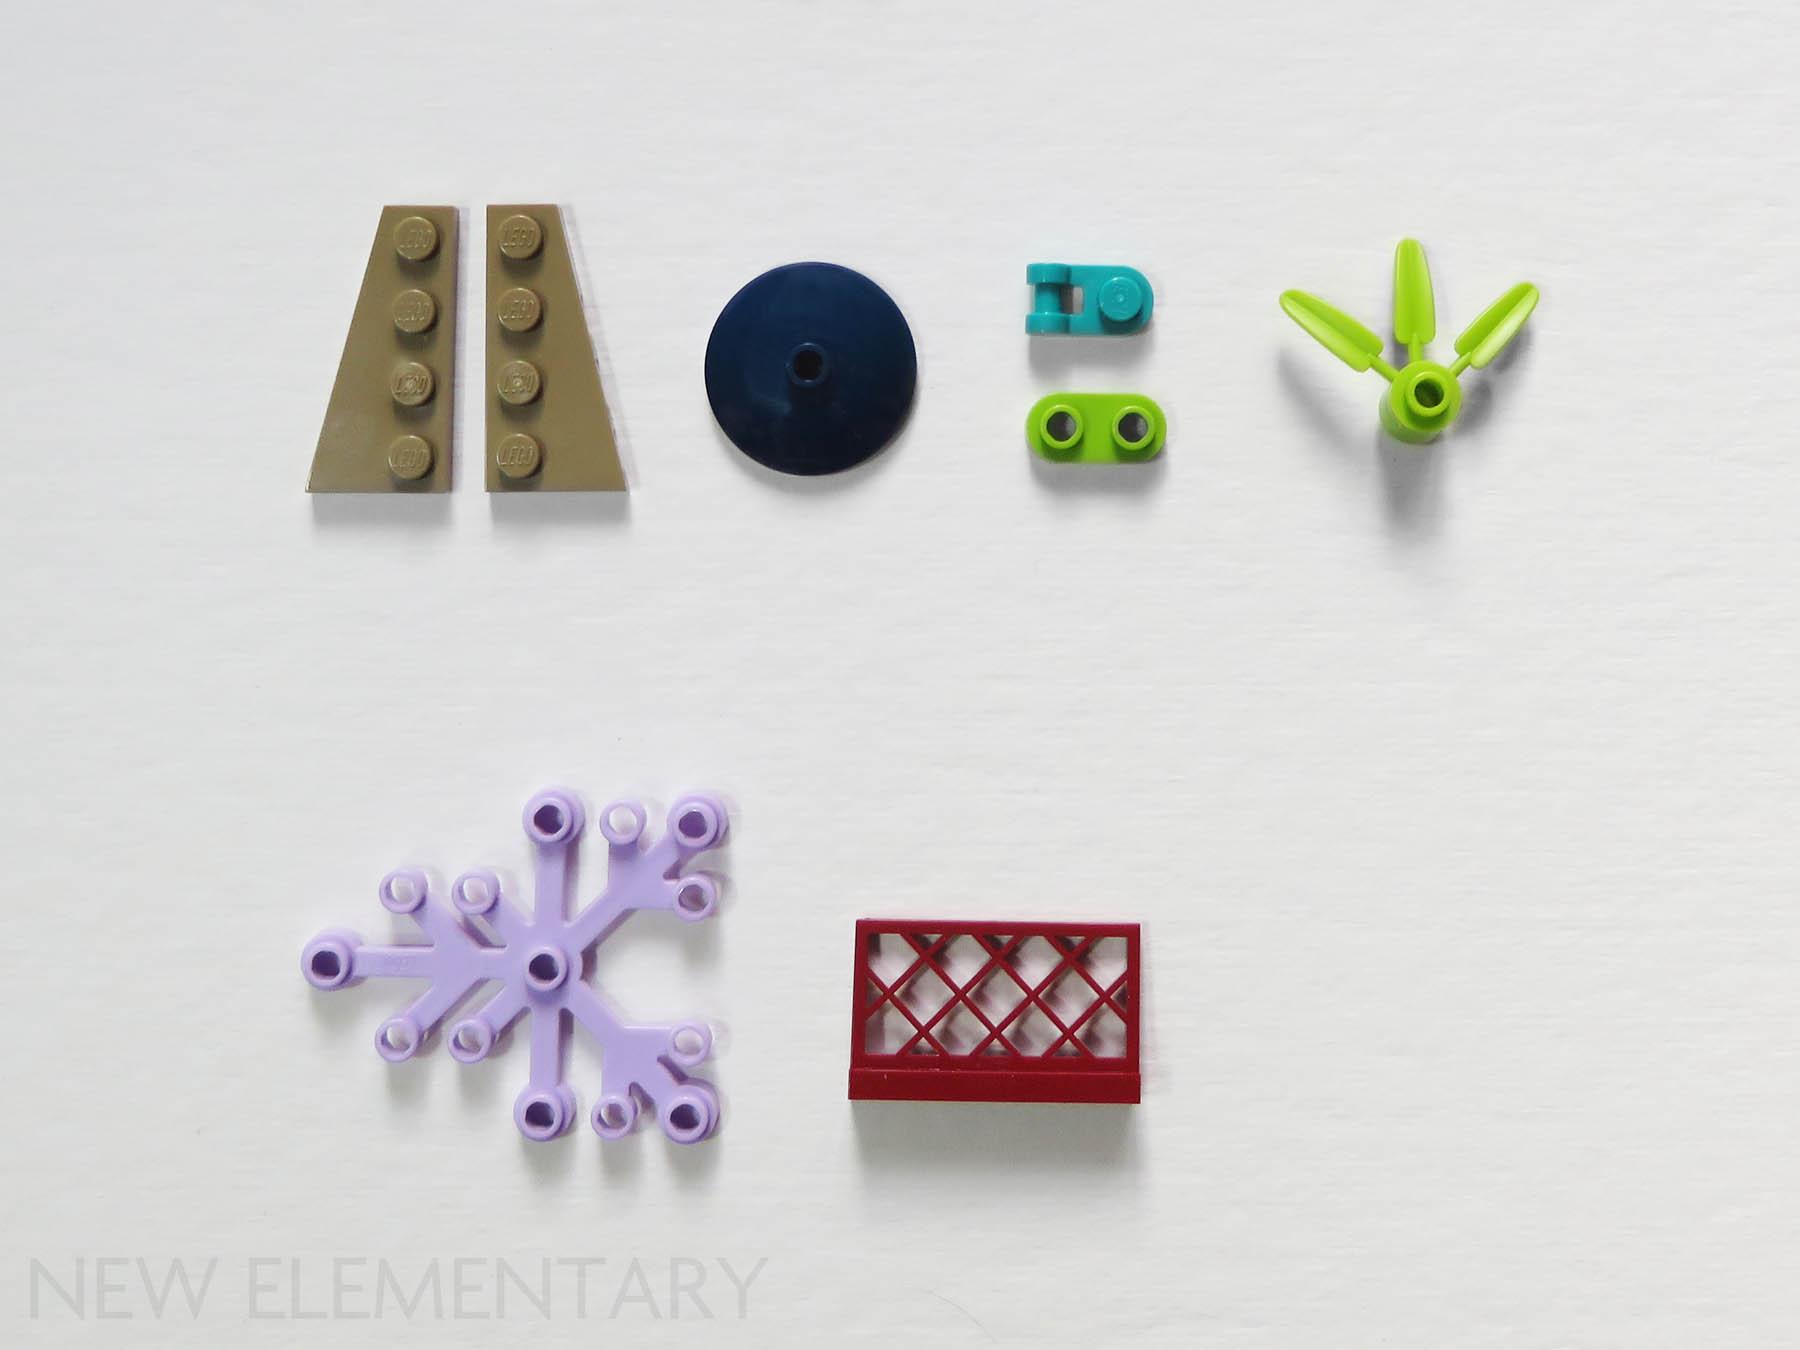 Lego 47407-2x flat wedge 4x6-Dark Blue//Dark Blue-new new